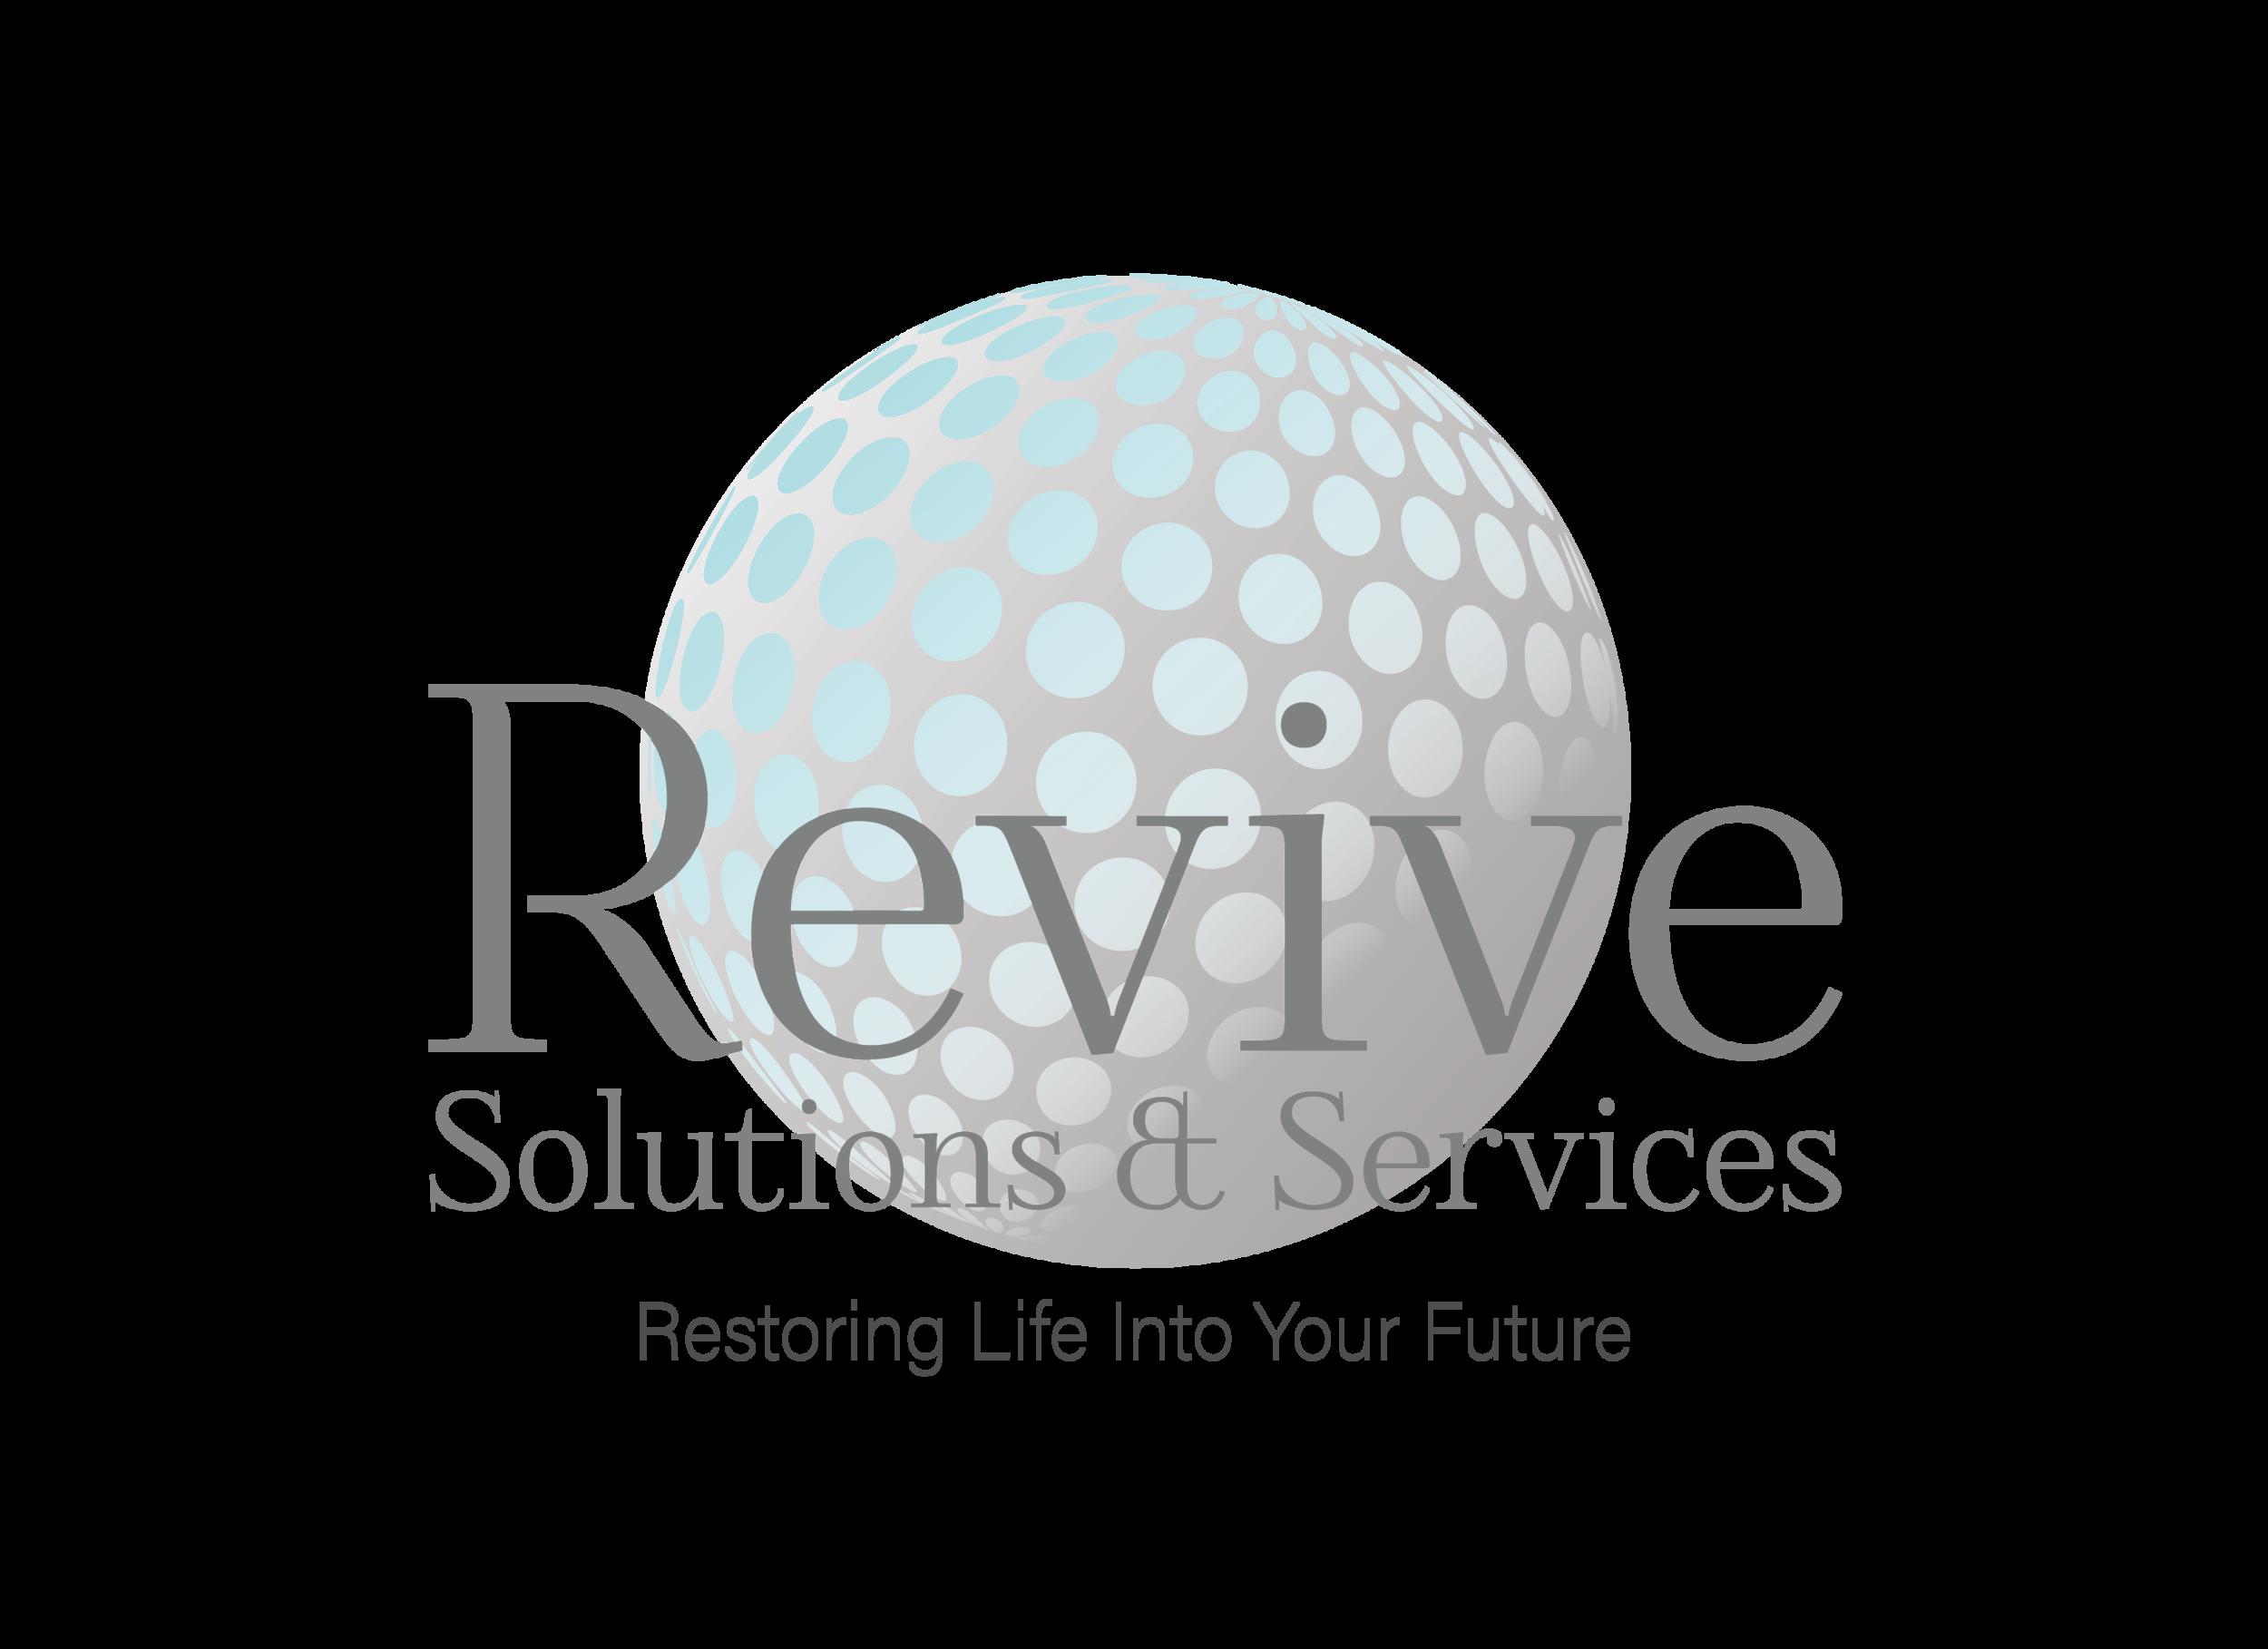 Revised Logo Design